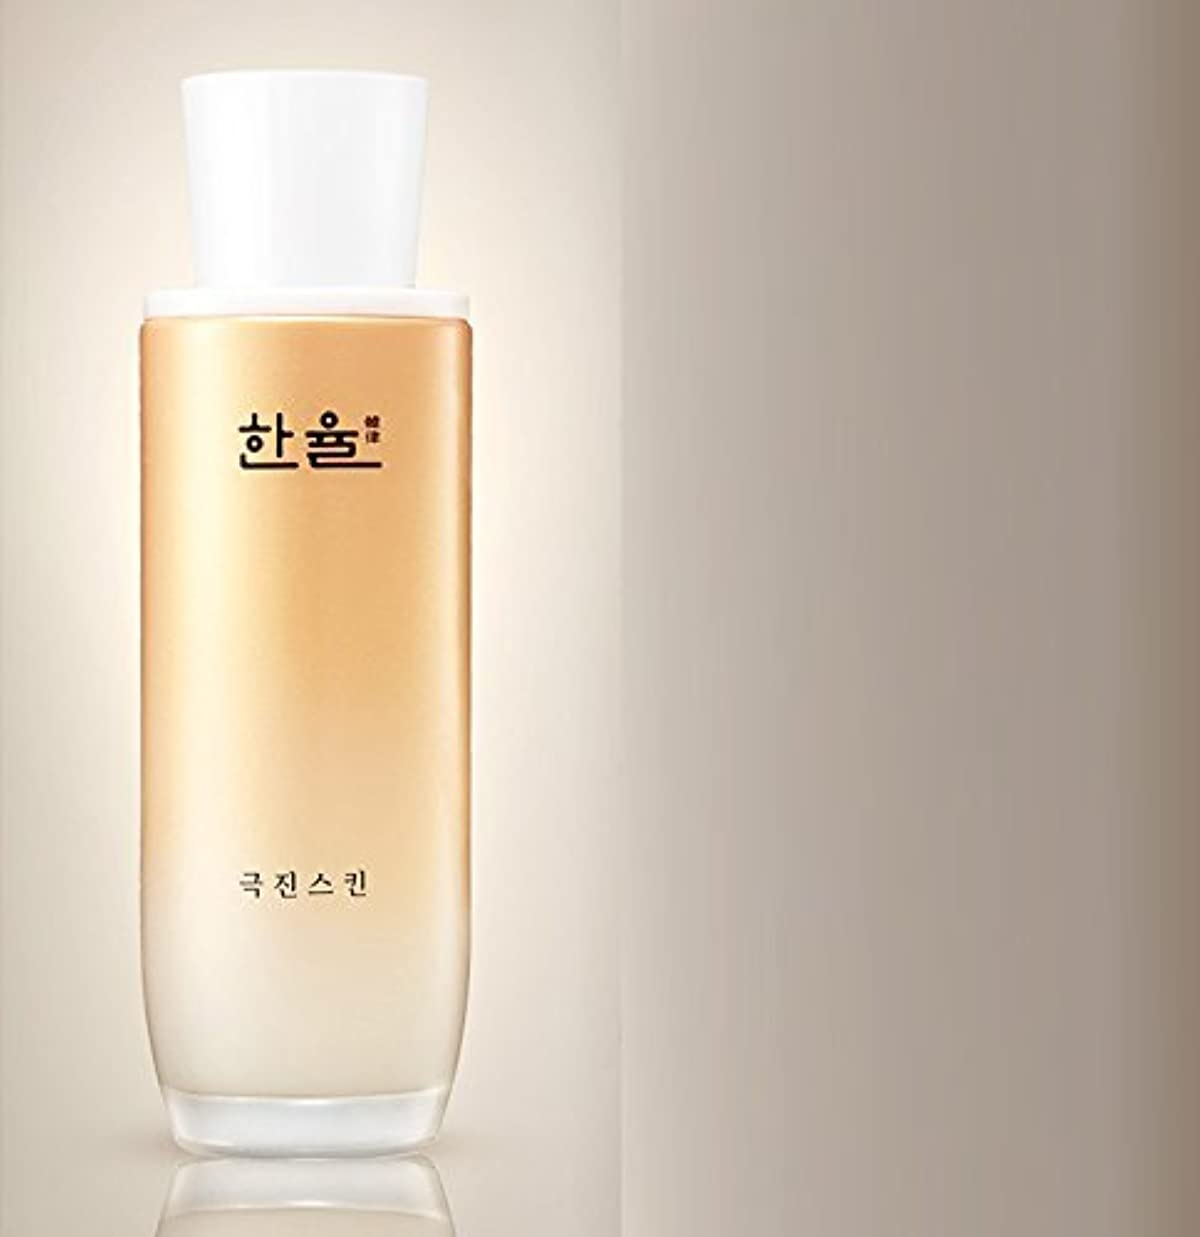 攻撃的変換論争的Hanyul Geuk Jin Toner 5 Ounce [並行輸入品]